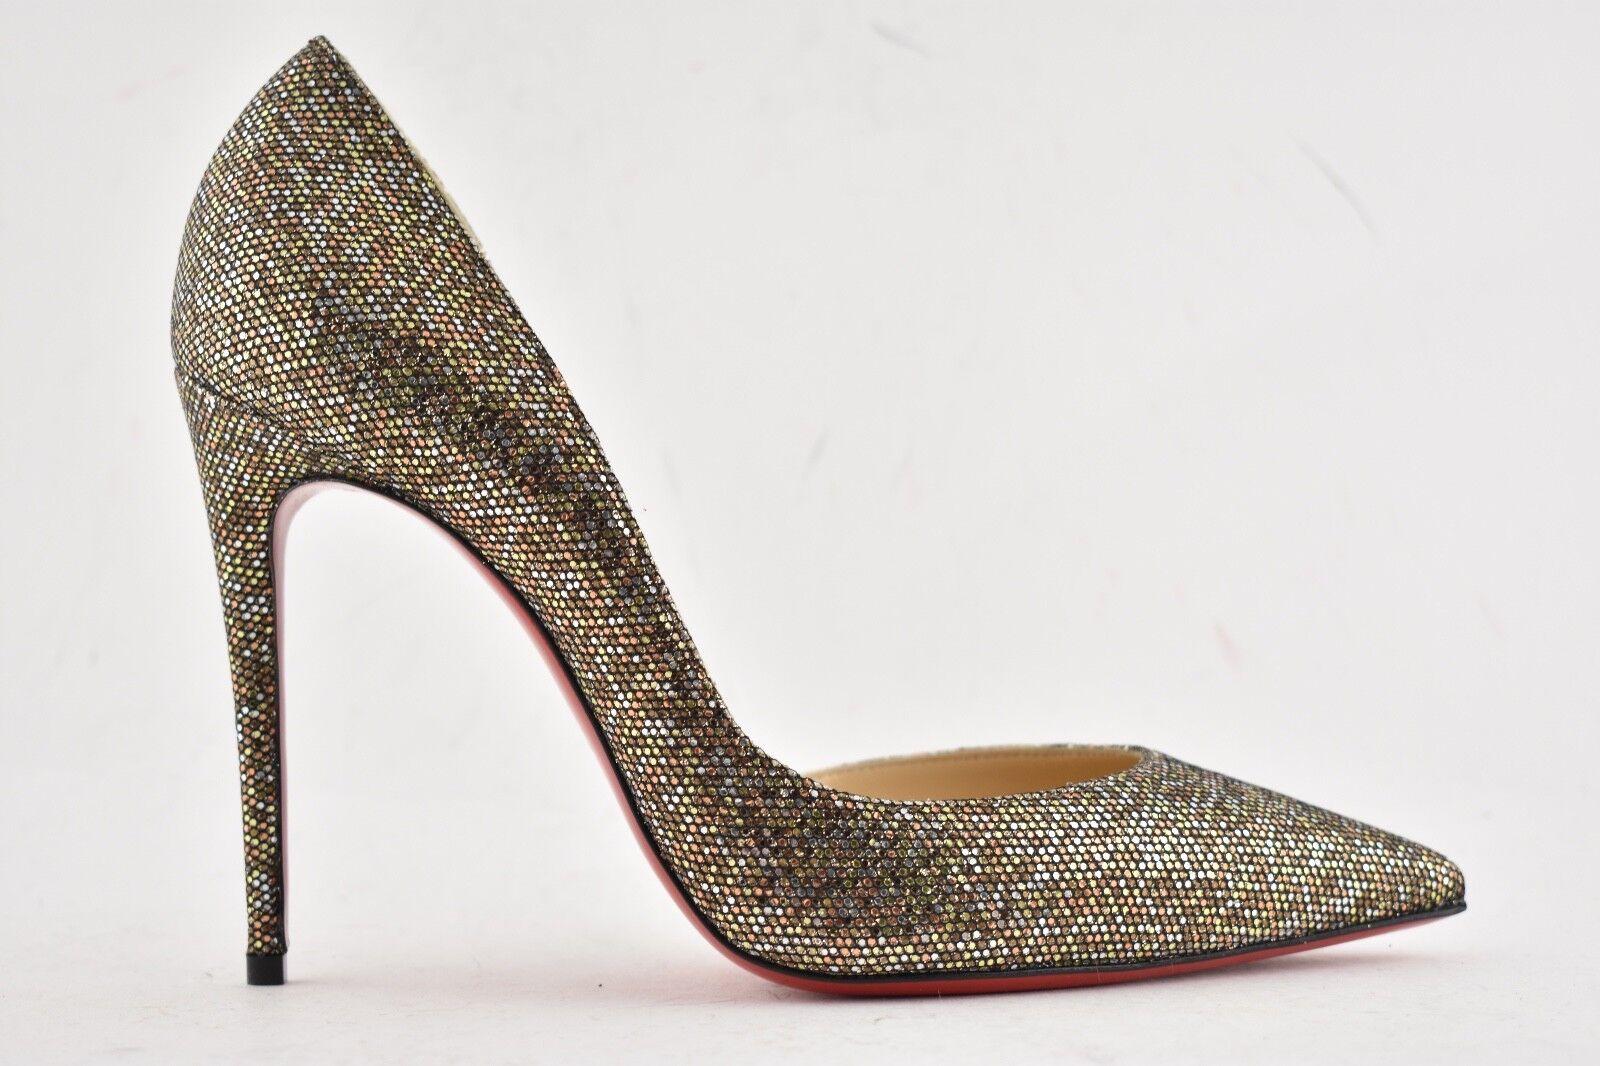 NIB Christian Louboutin Iriza 100 gold Bronze Glitter Regina Oxy Heel Pump 41.5